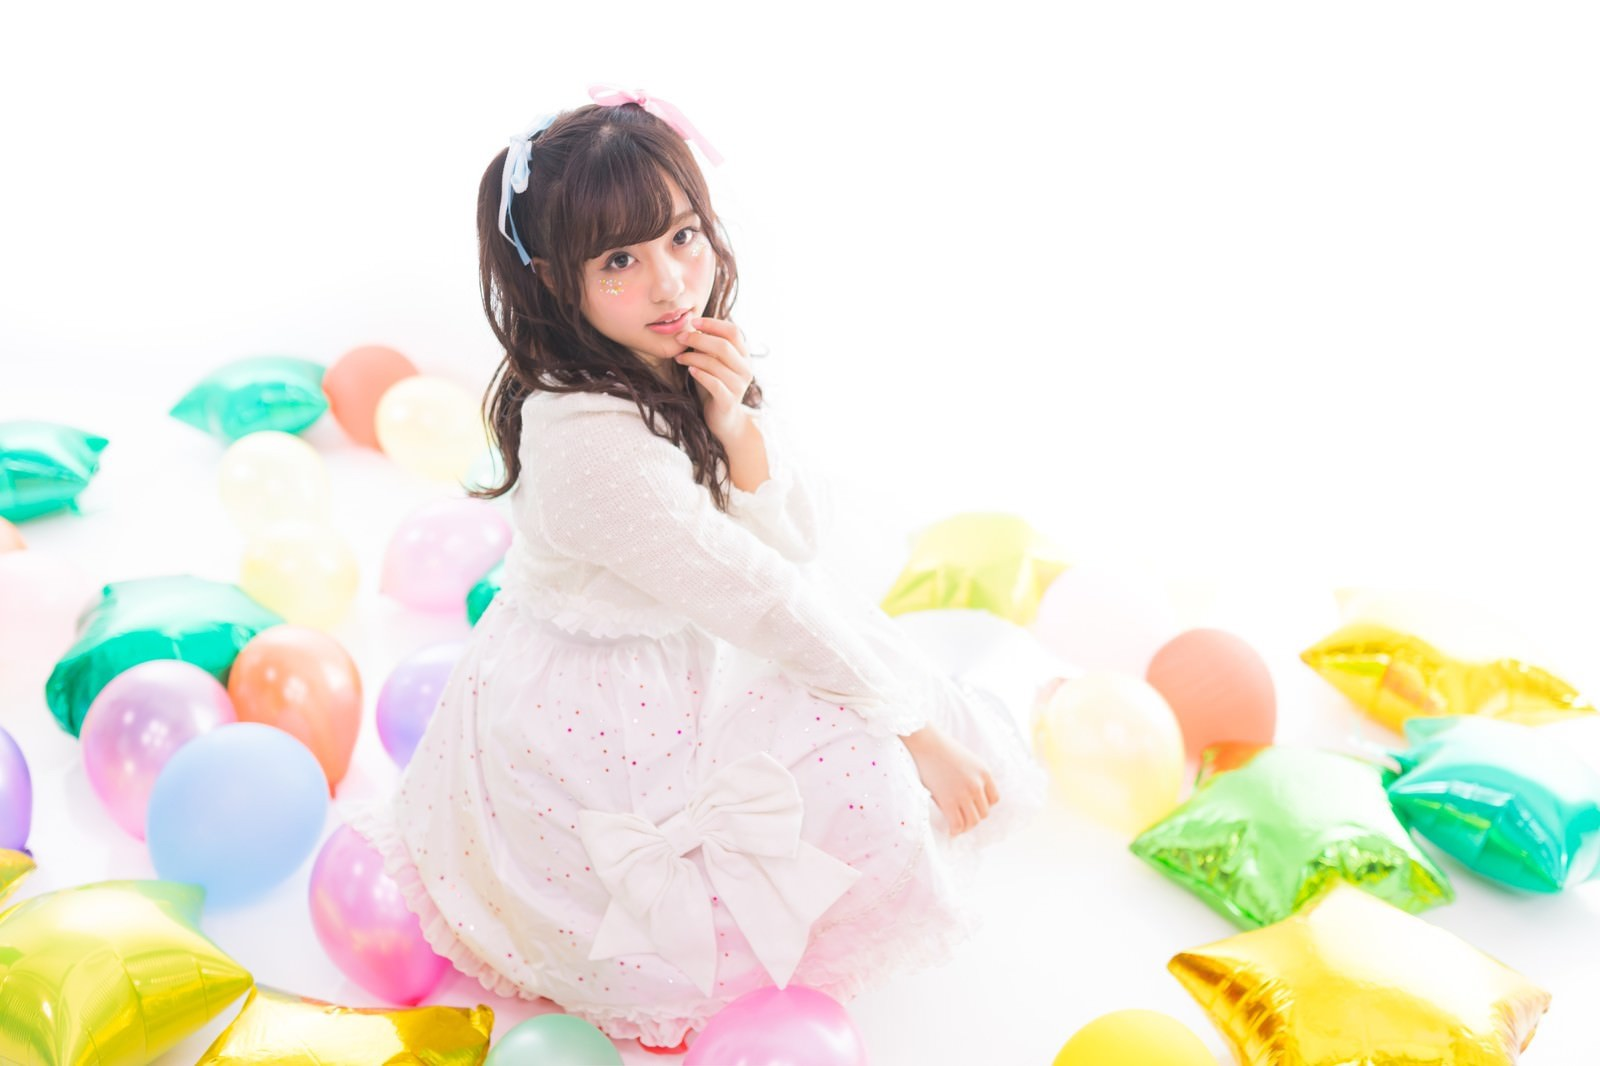 Yuka Kawamura Free Stock Photo Idol 02